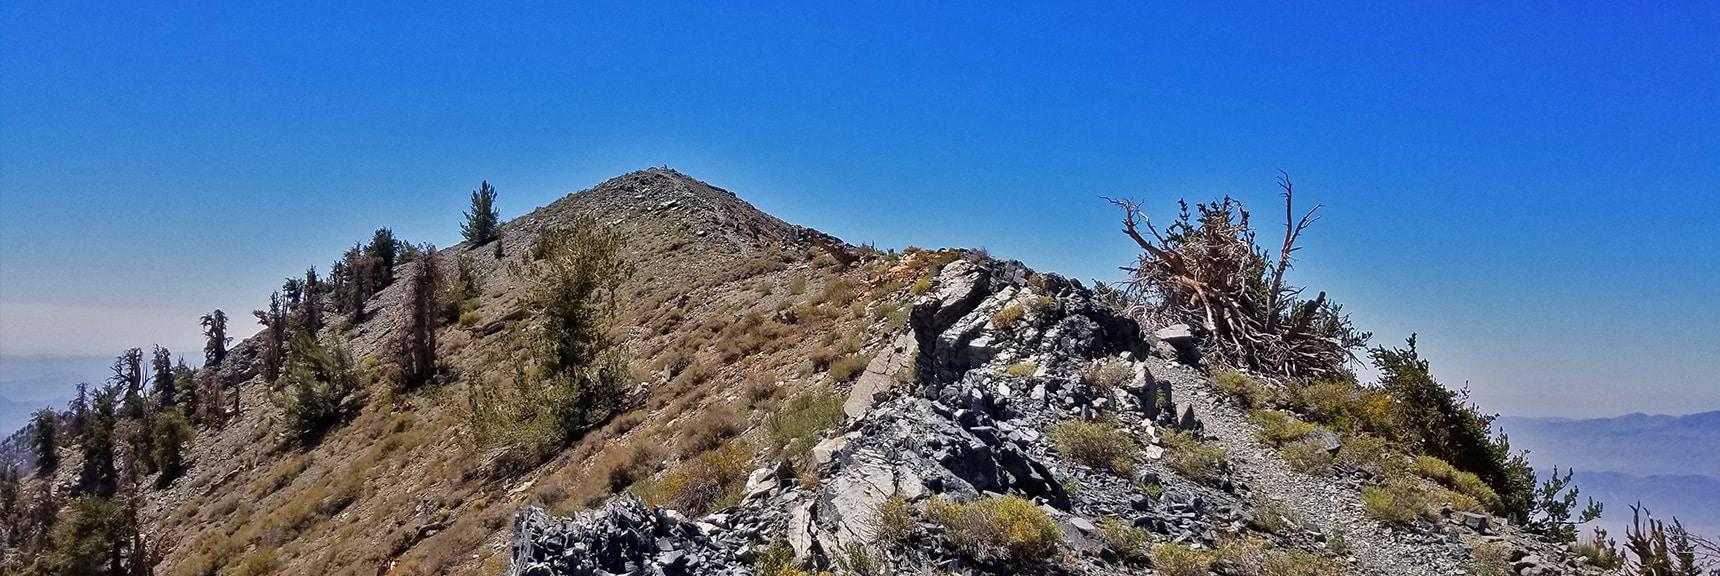 Arrival on Telescope Peak Summit Ridge. True Summit Ahead!   Telescope Peak Summit from Wildrose Charcoal Kilns Parking Area, Panamint Mountains, Death Valley National Park, California